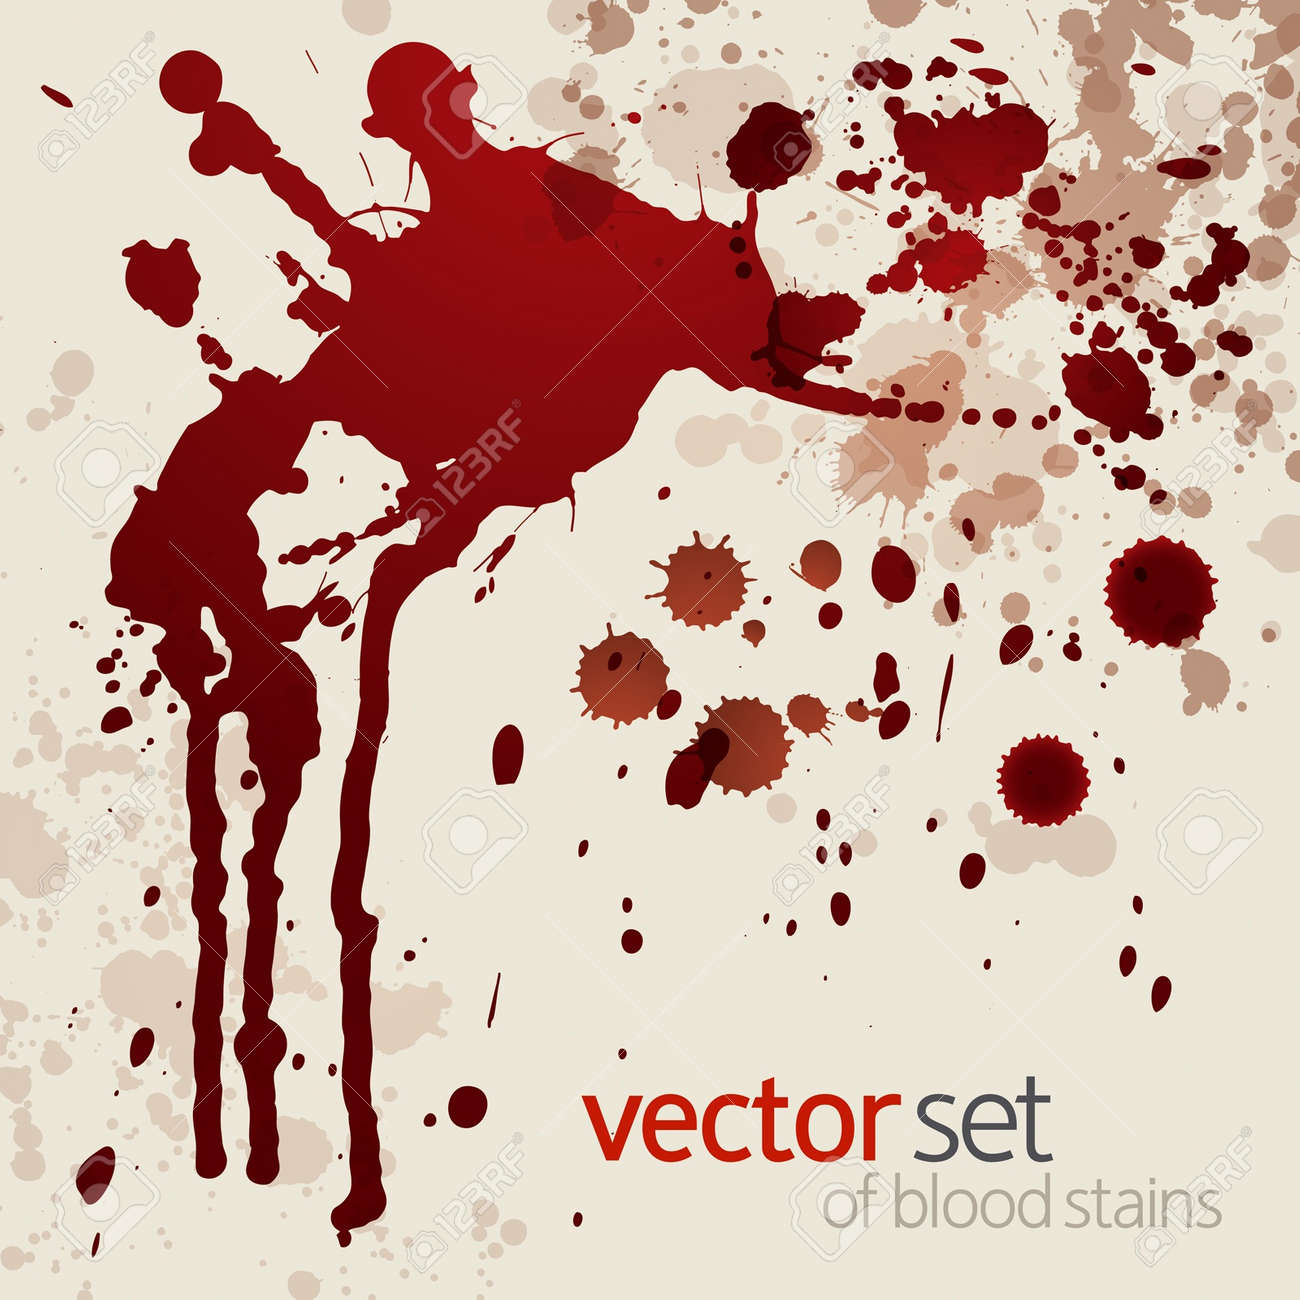 Splattered blood stains,background Stock Vector - 14792100